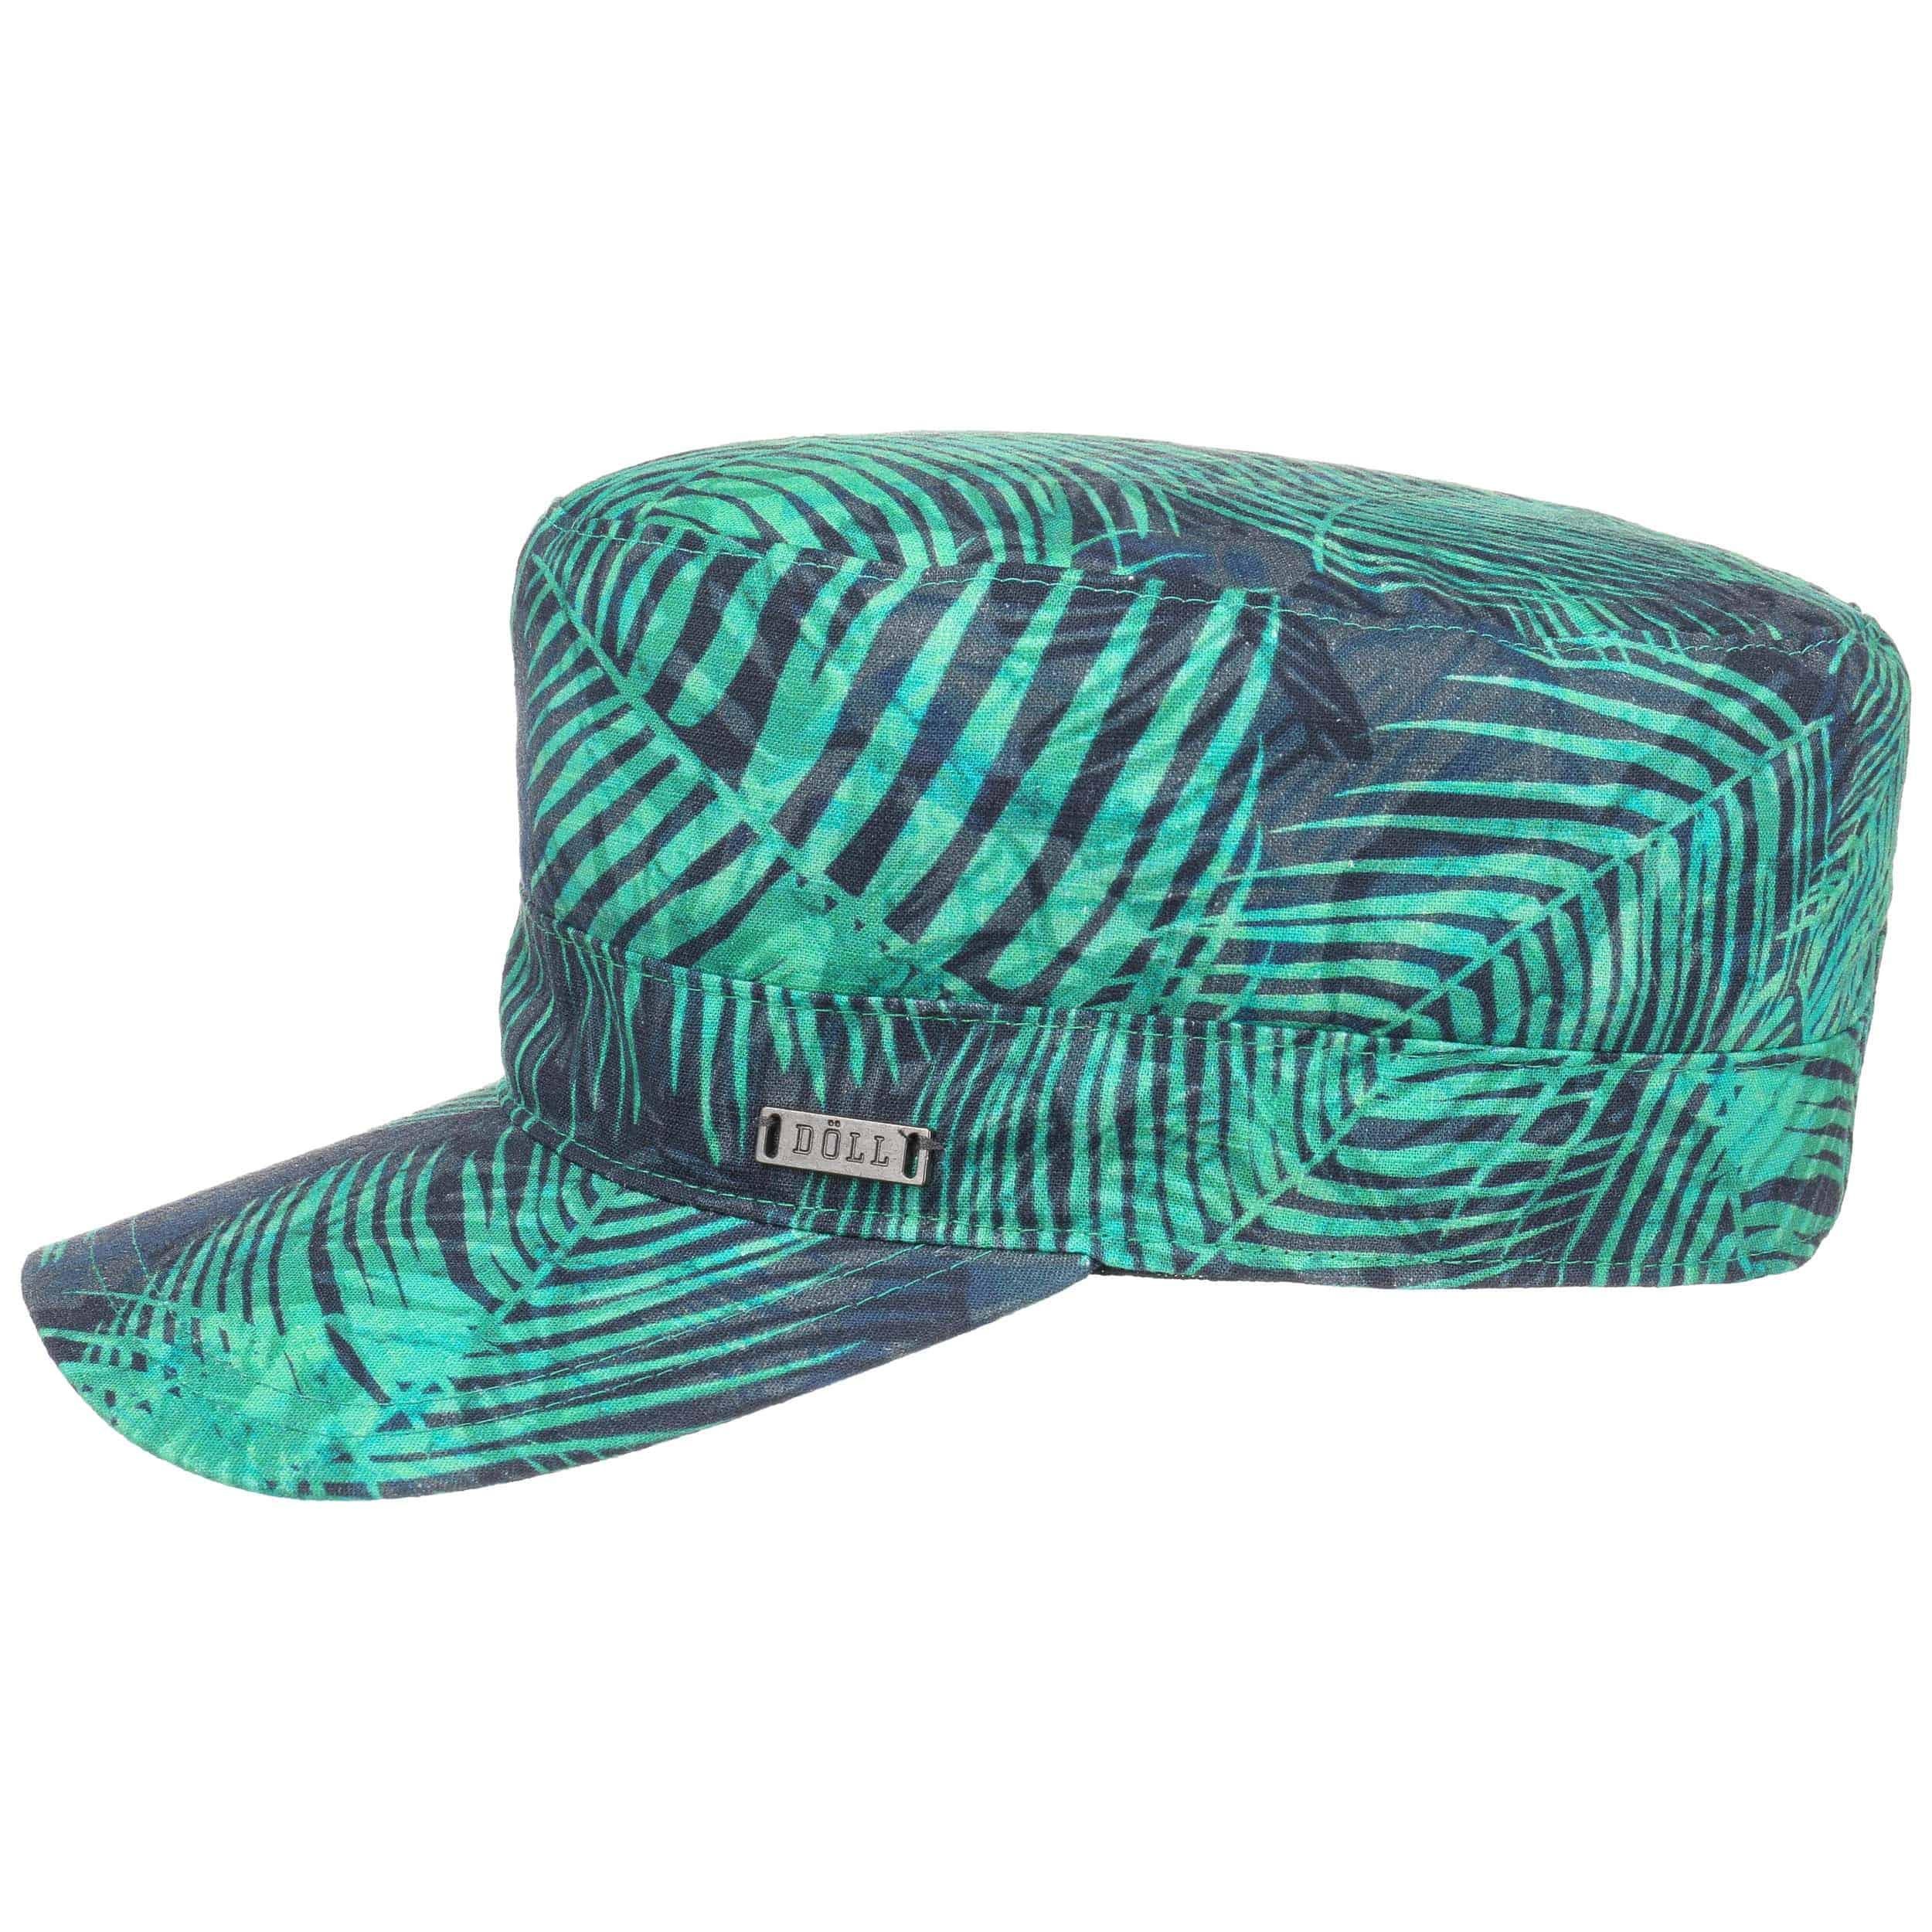 ... blu scuro 5 · Cappellino Army Palma Anti UV by Döll - verde 6 f14d709abda8